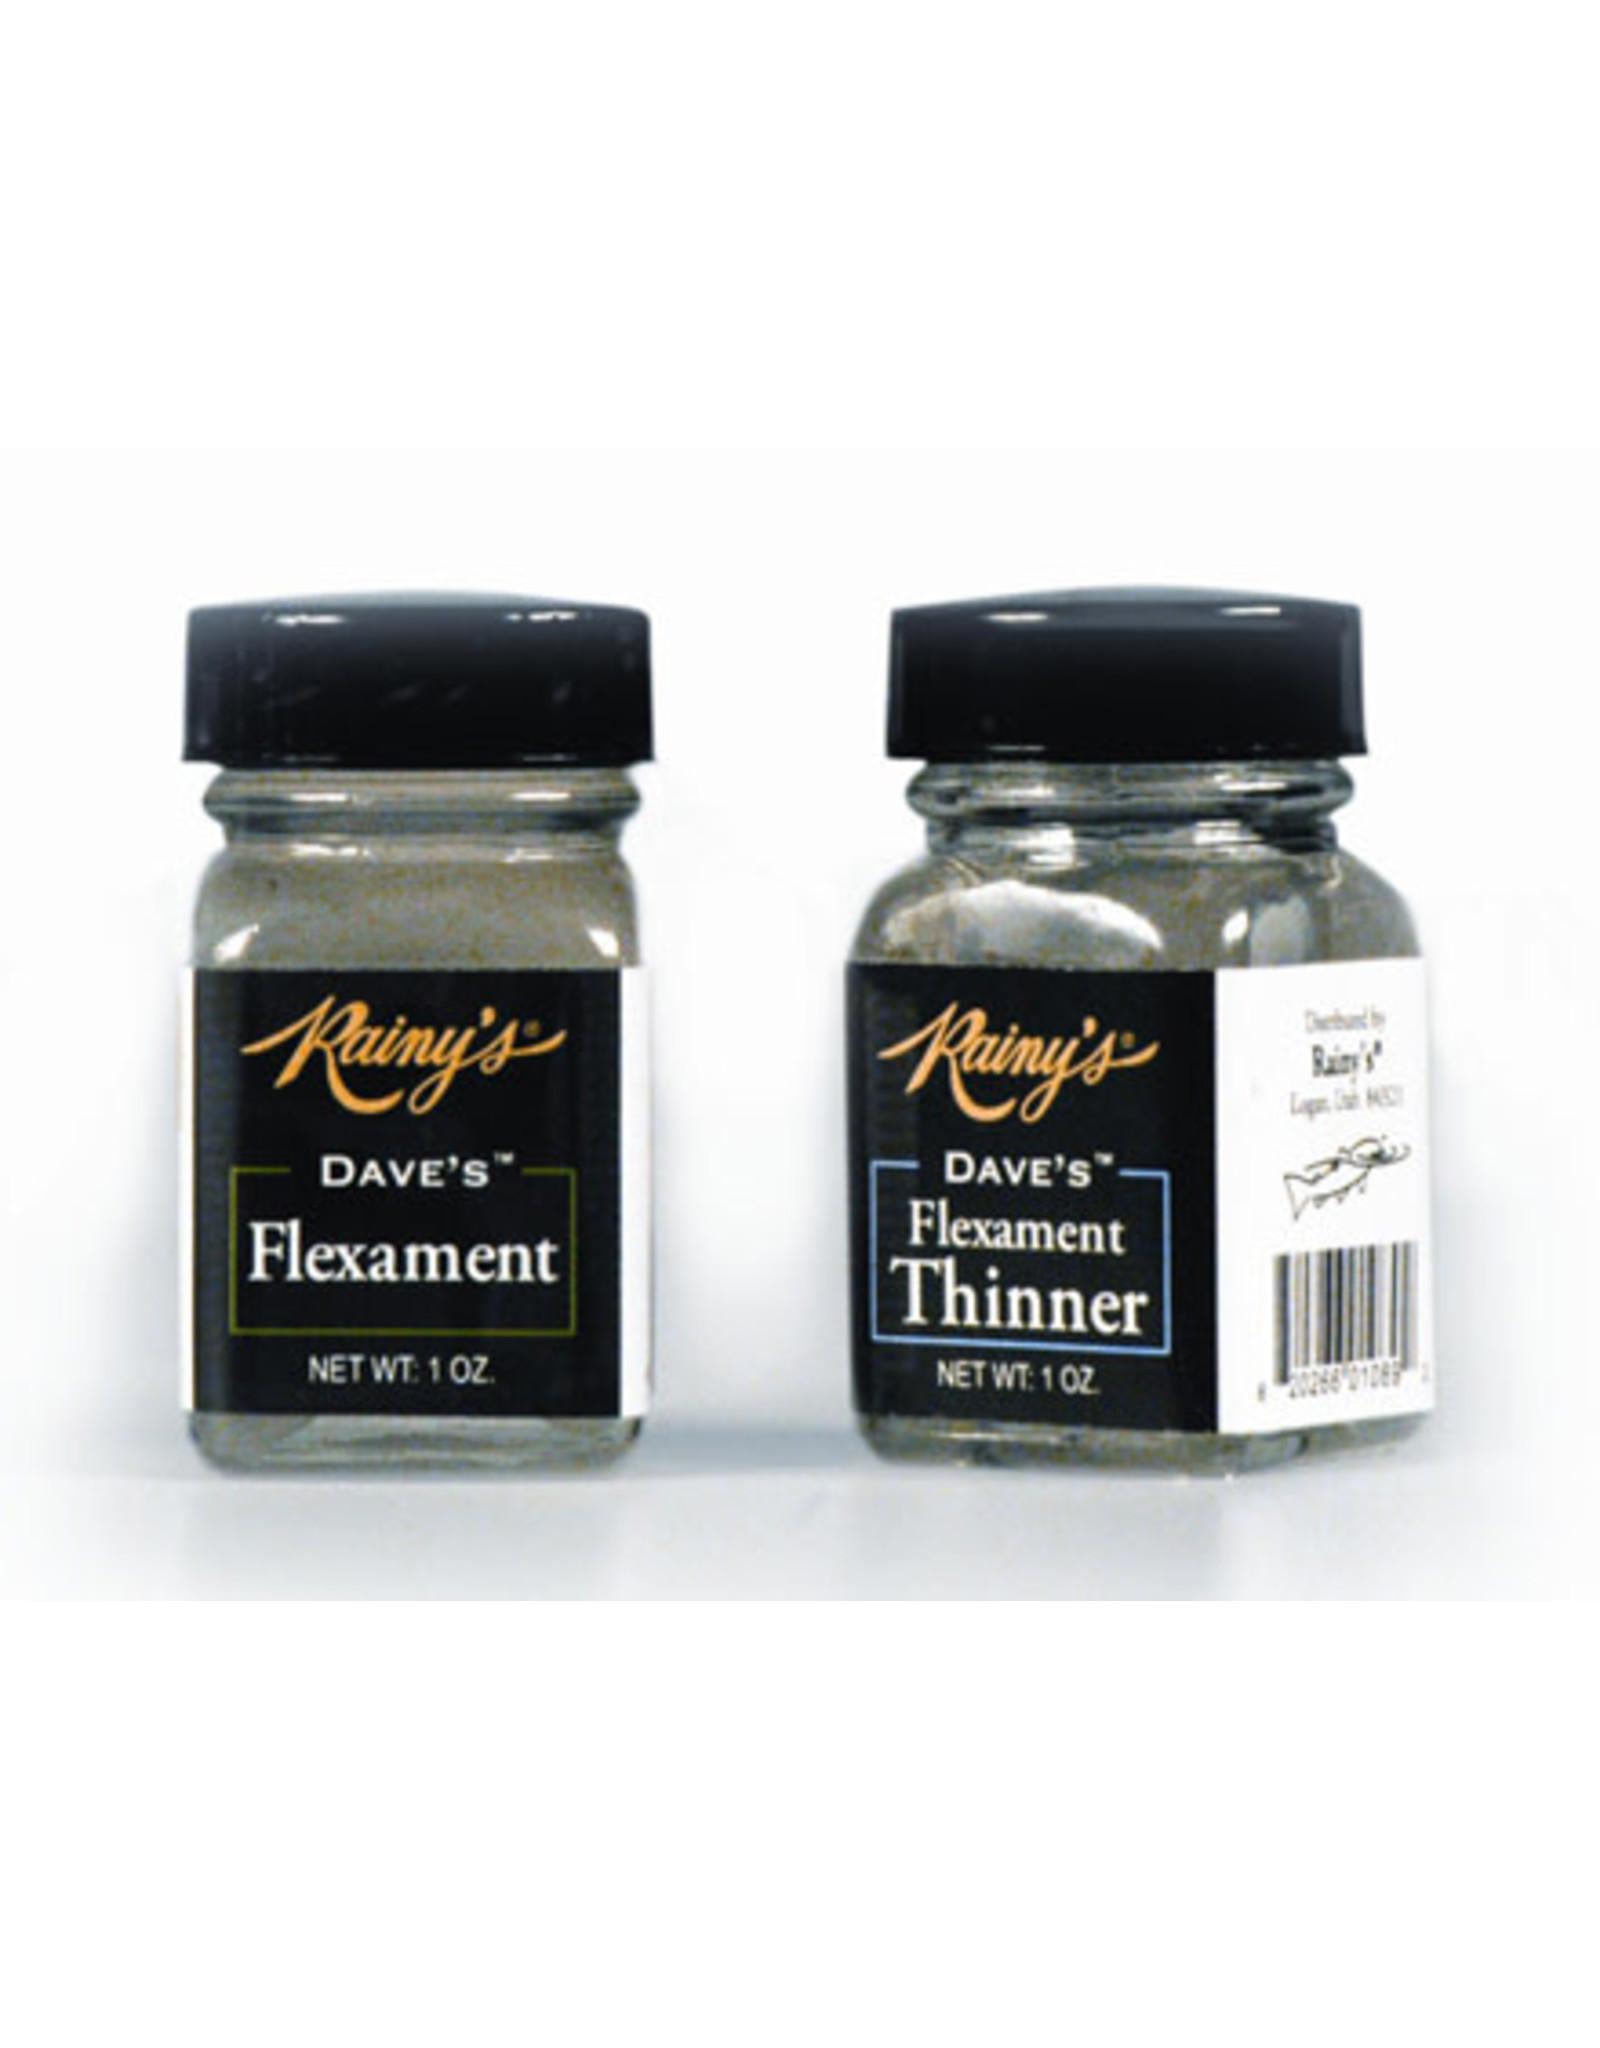 RAINY'S Dave's Flexament Thinner, 1 oz